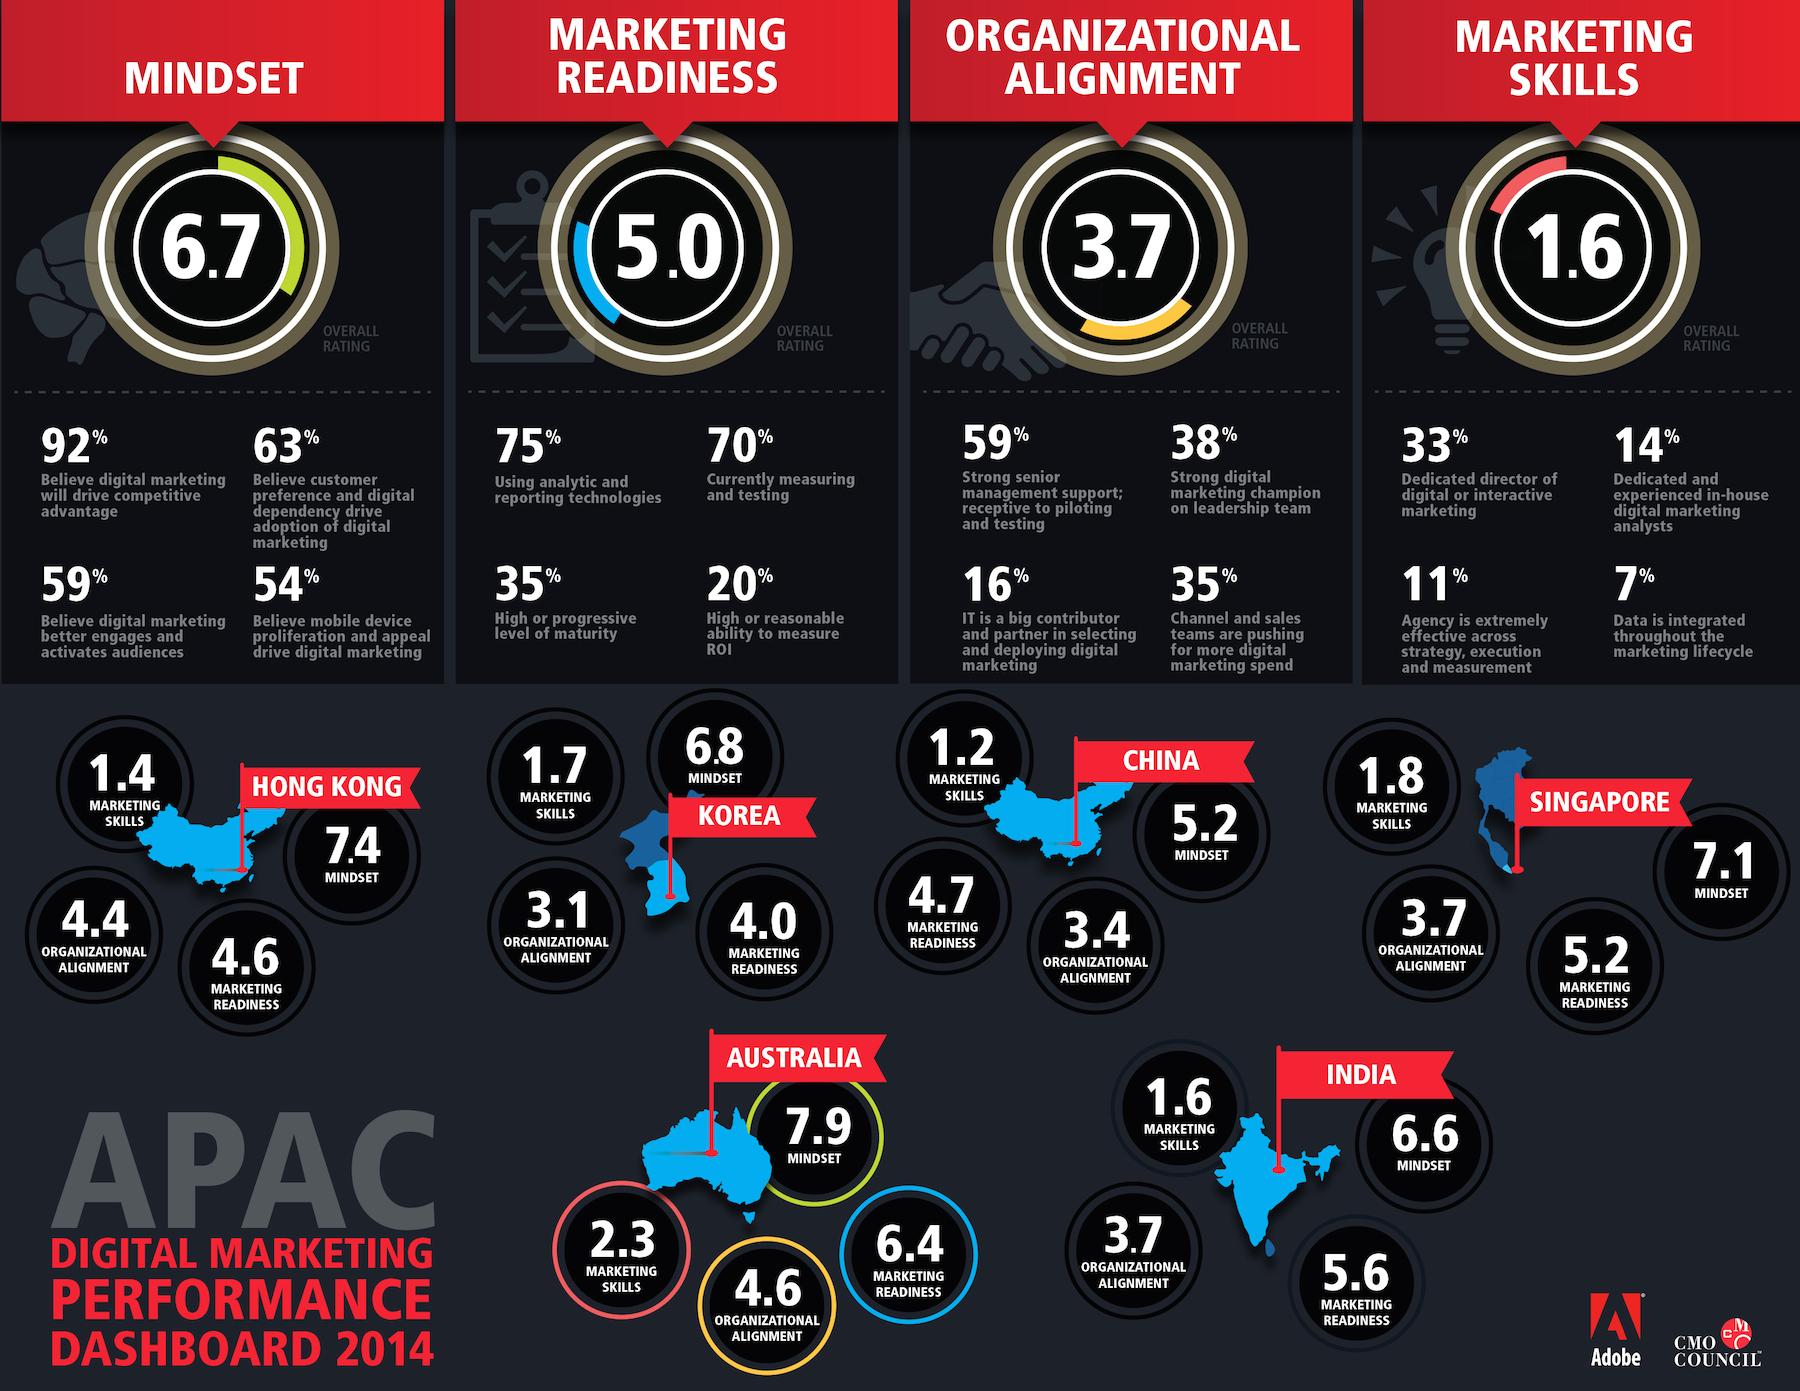 Adobe_APAC_infographic_FINAL_2014_9-16-14